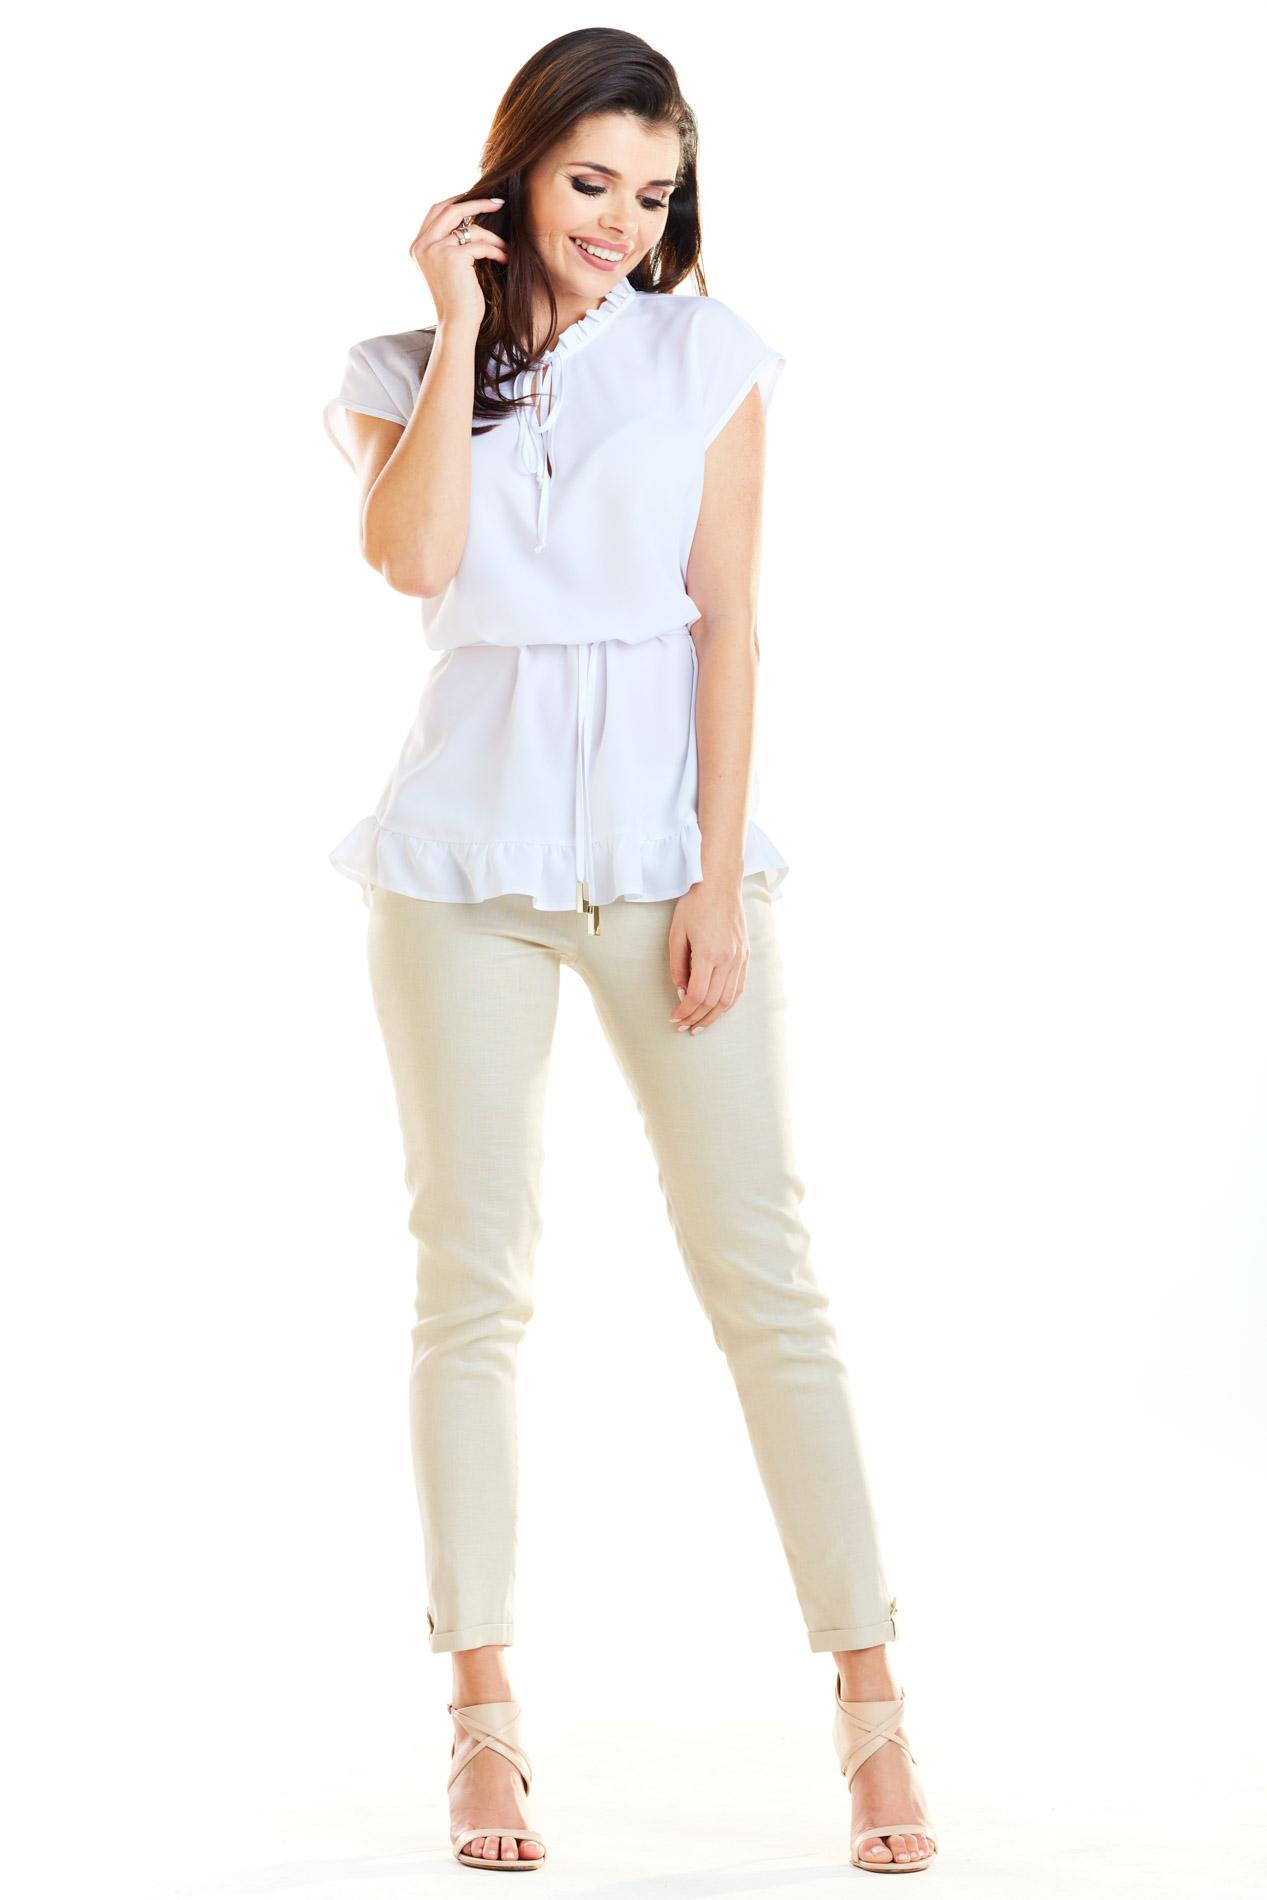 d1e5d0042e60 ... CM4180 Kobieca bluzka z krótkim rękawem - biała ...